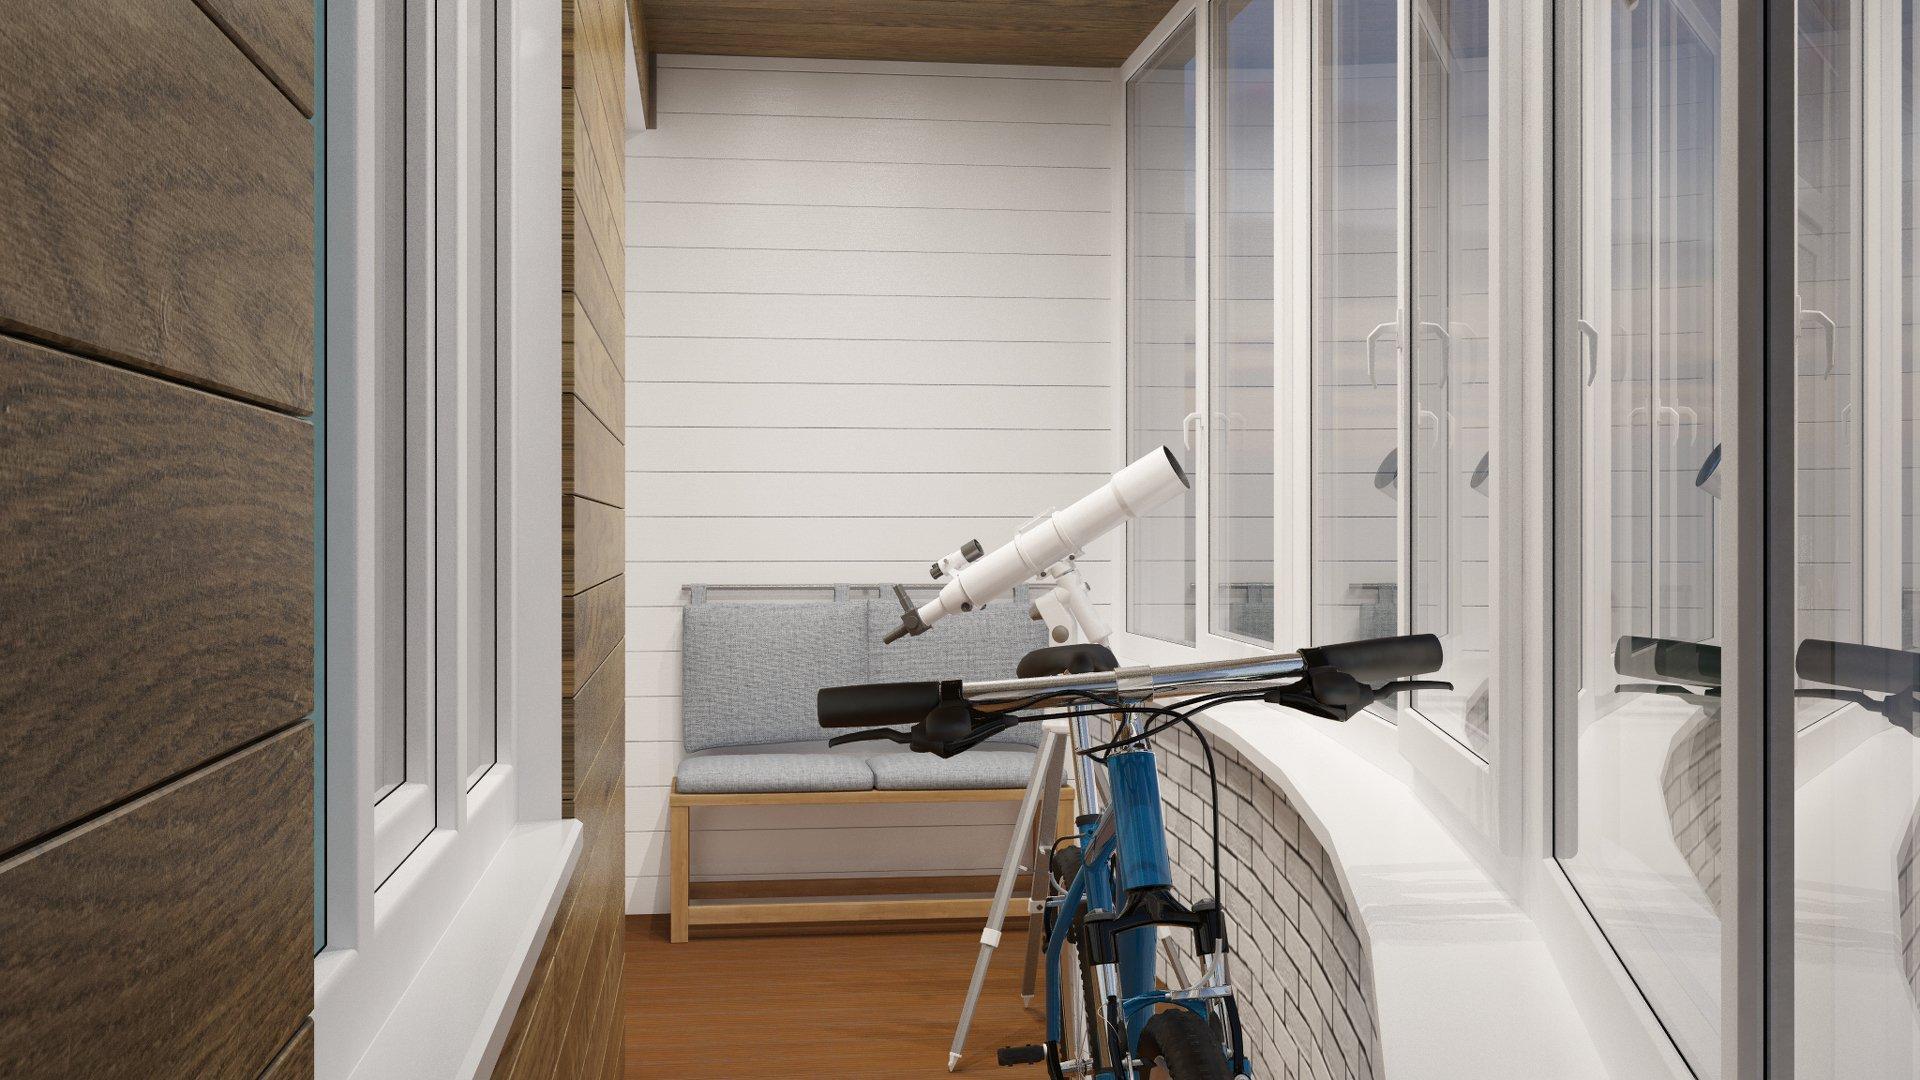 Teleskop ved vinduet